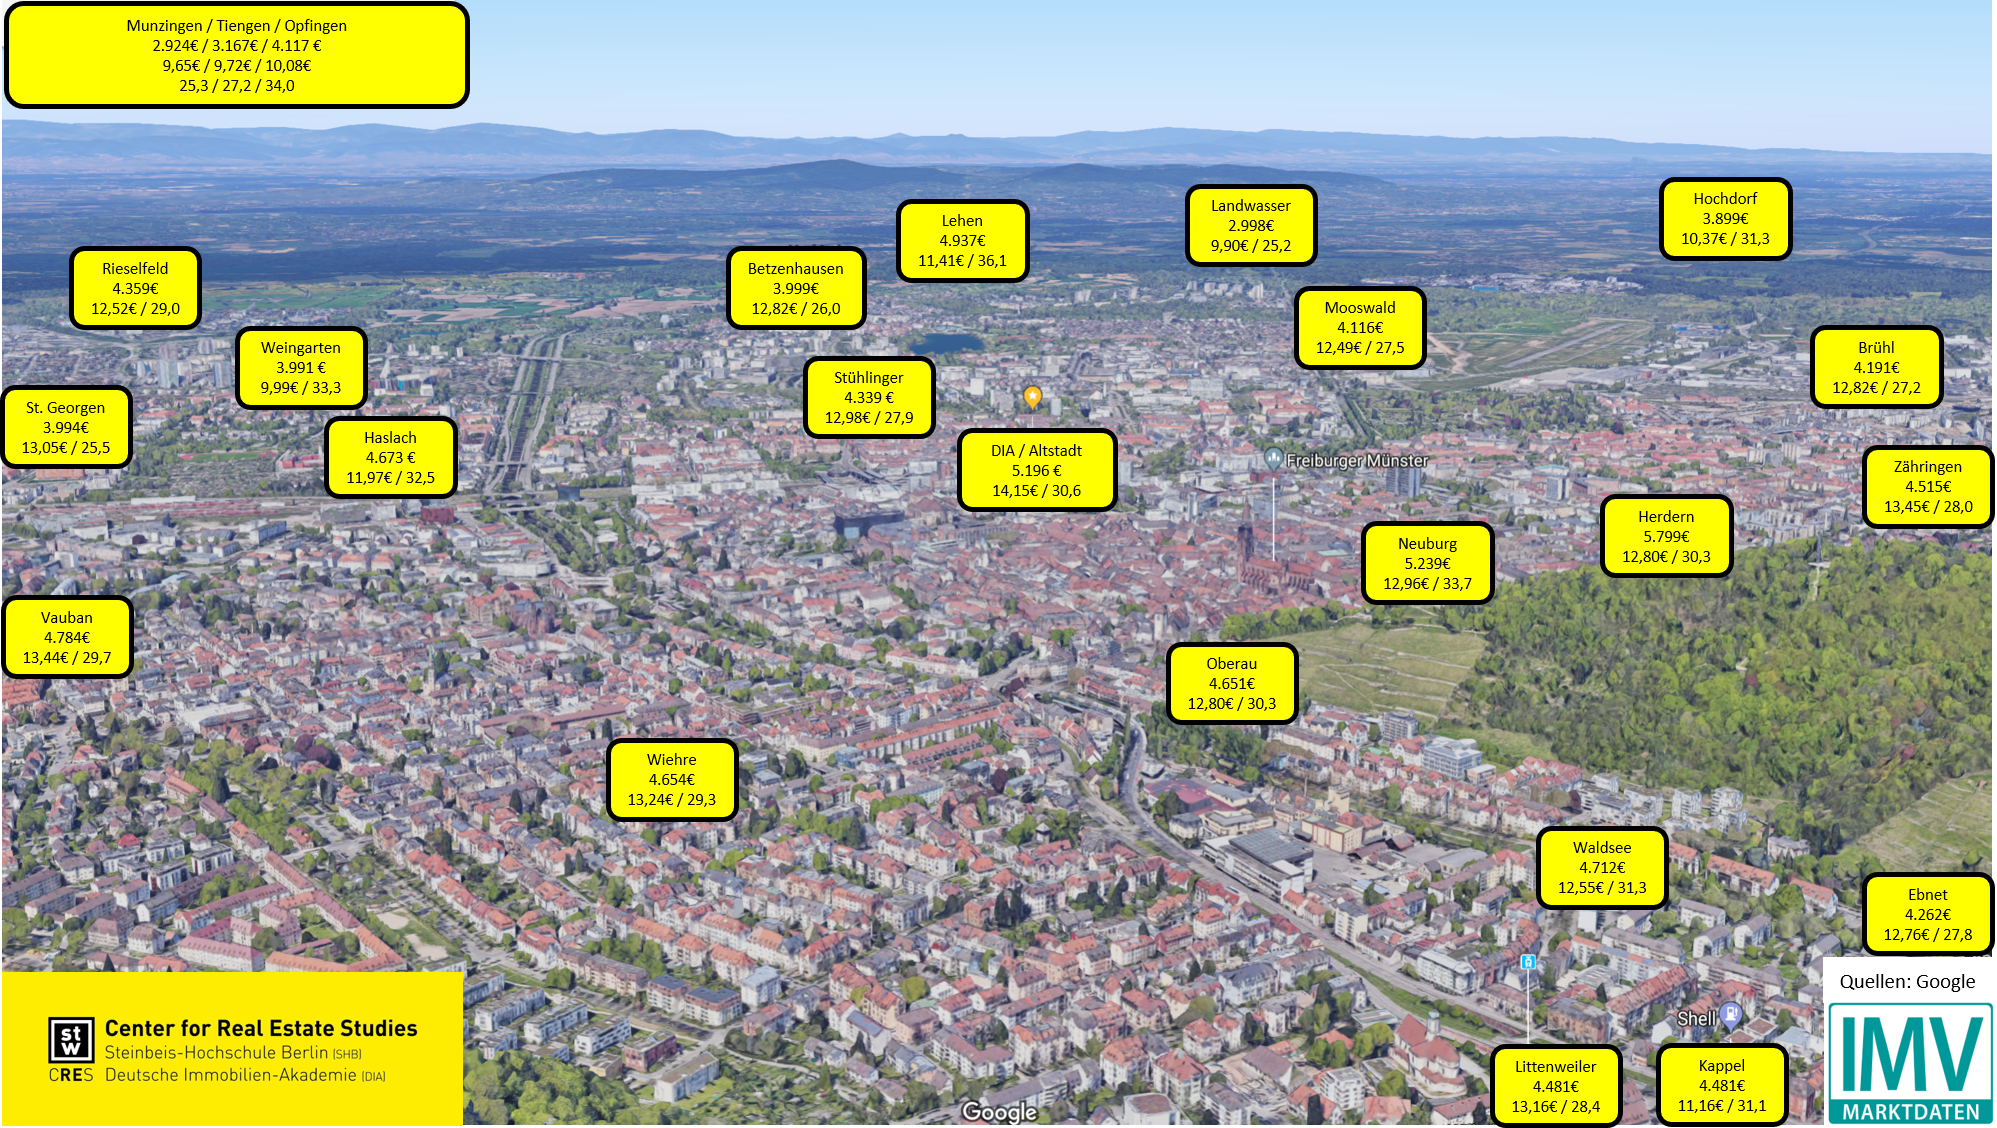 Freiburg Karte Stadtteile.Freiburger Immobilienwetter 2019 Center For Real Estate Studies